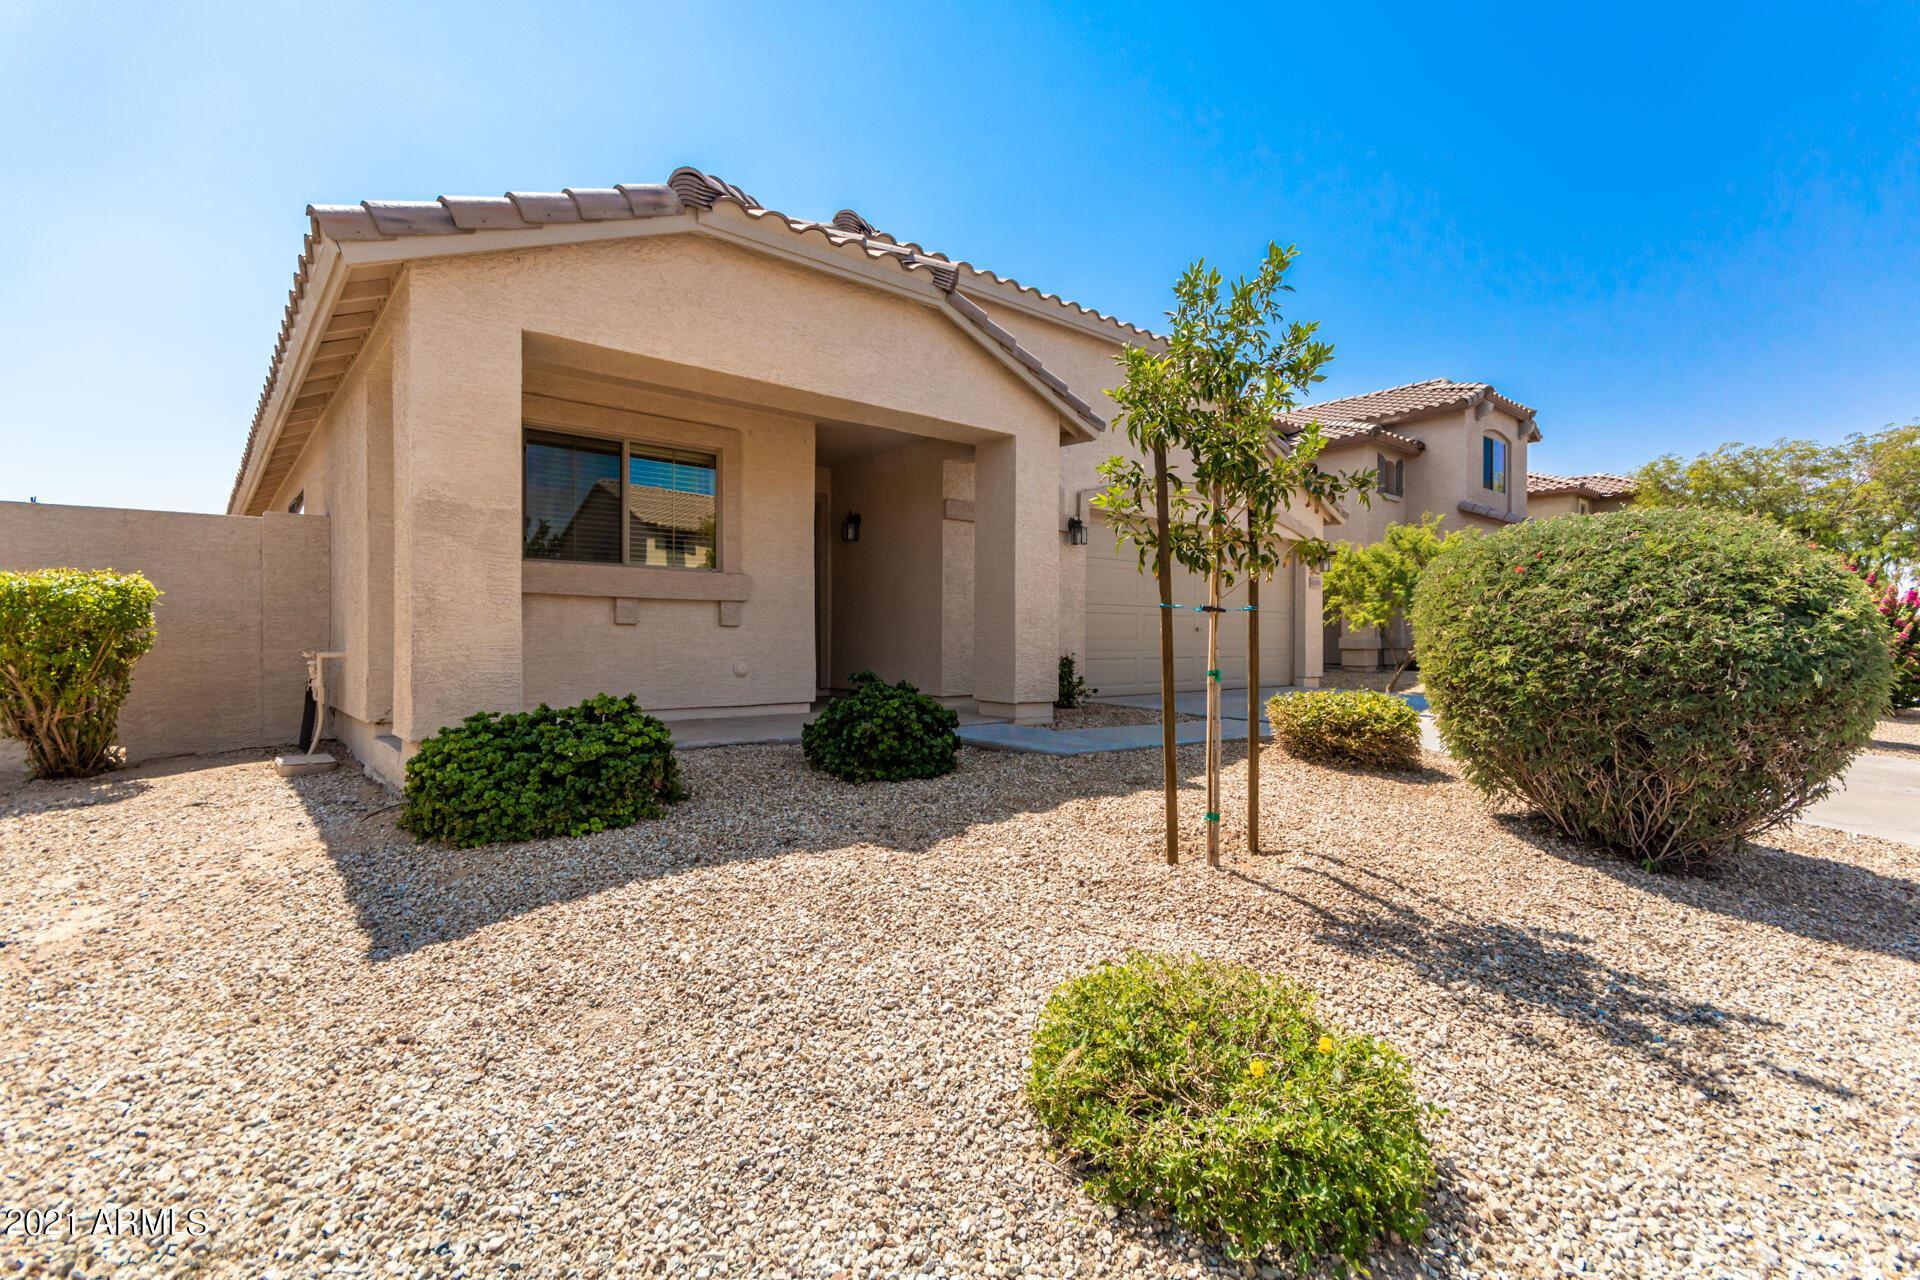 Photo of 44181 W LINDGREN Drive, Maricopa, AZ 85138 (MLS # 6295178)